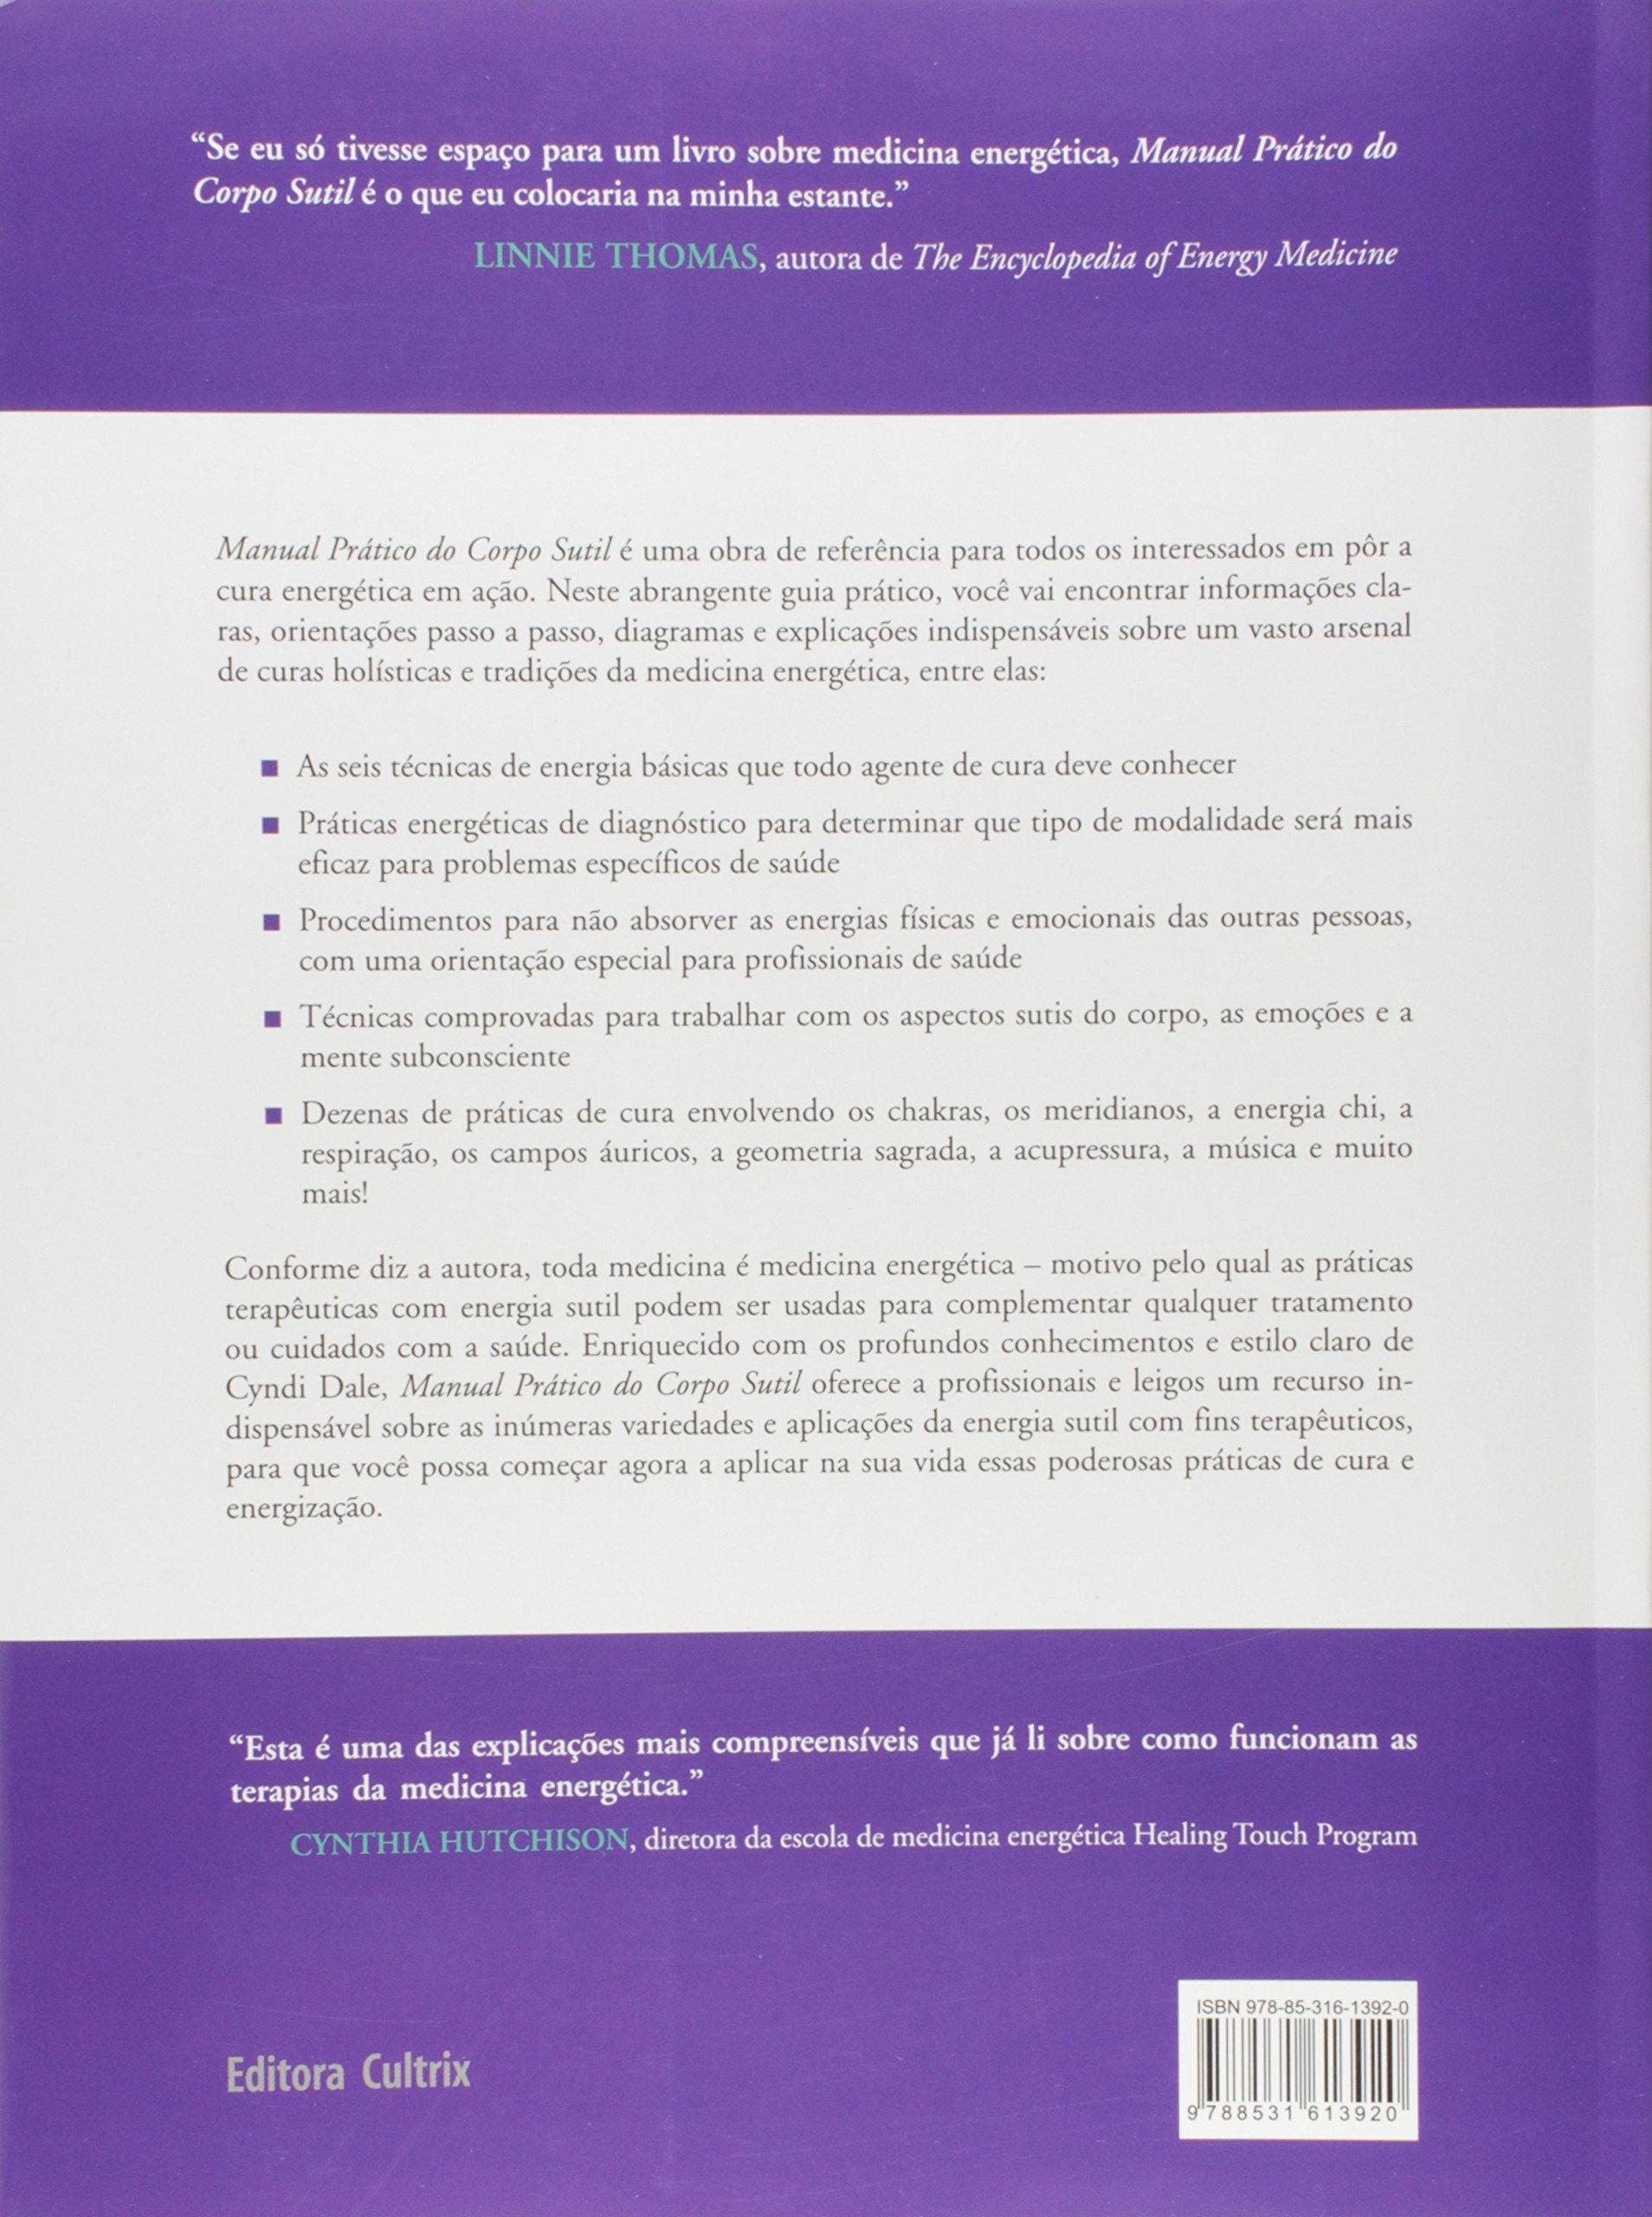 Manual pratico do corpo sutil o guia definitivo para compreender a cura energetica cyndi dale 9788531613920 amazon com books